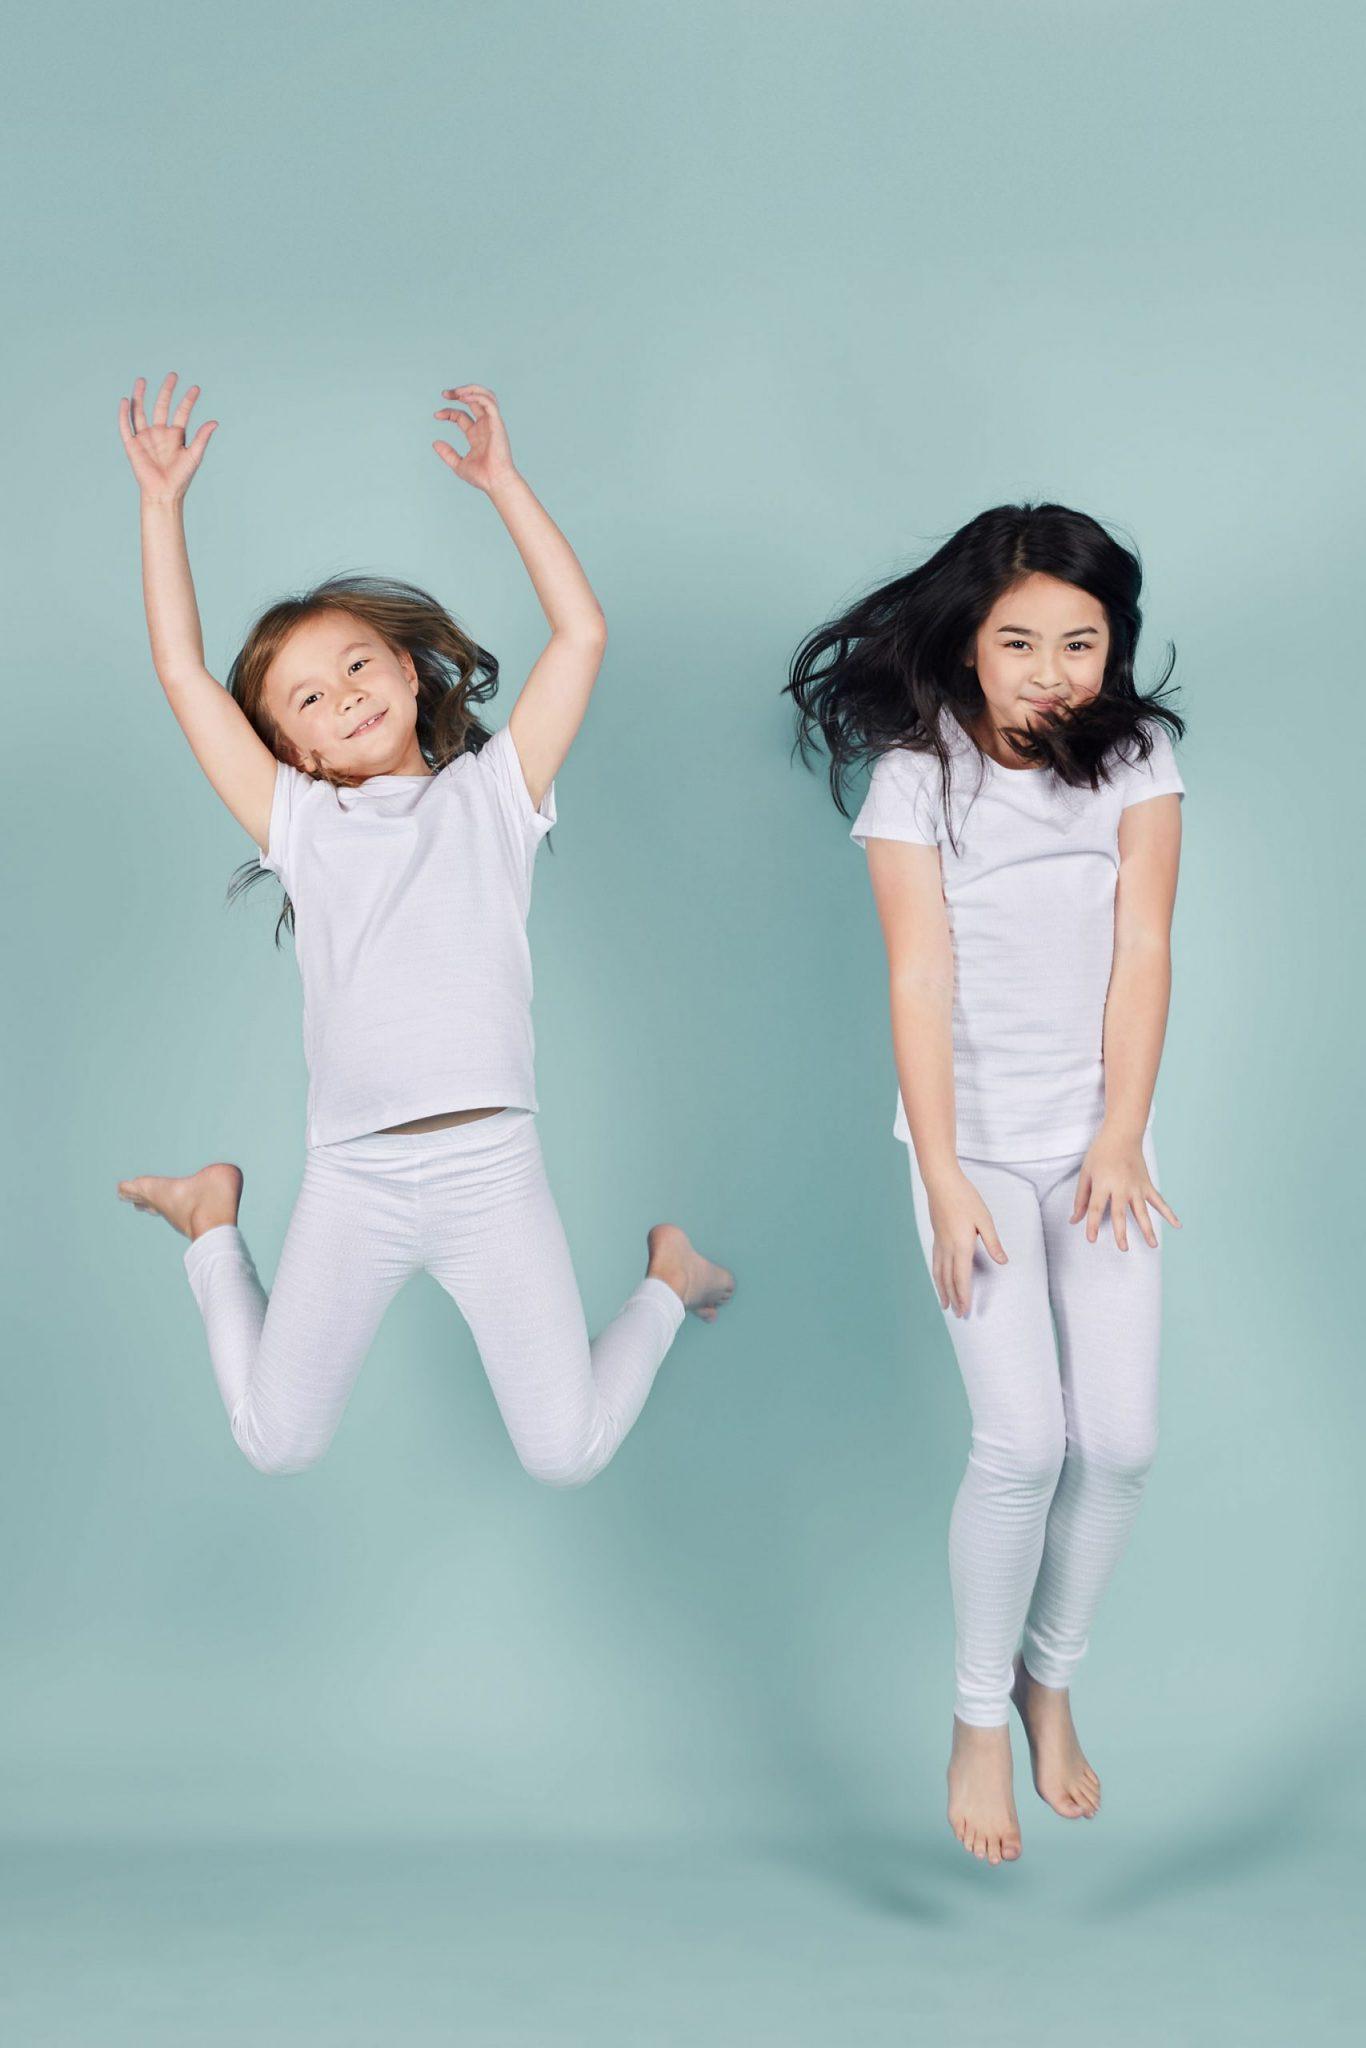 kids-studio-photography-the-jersey-shop-3